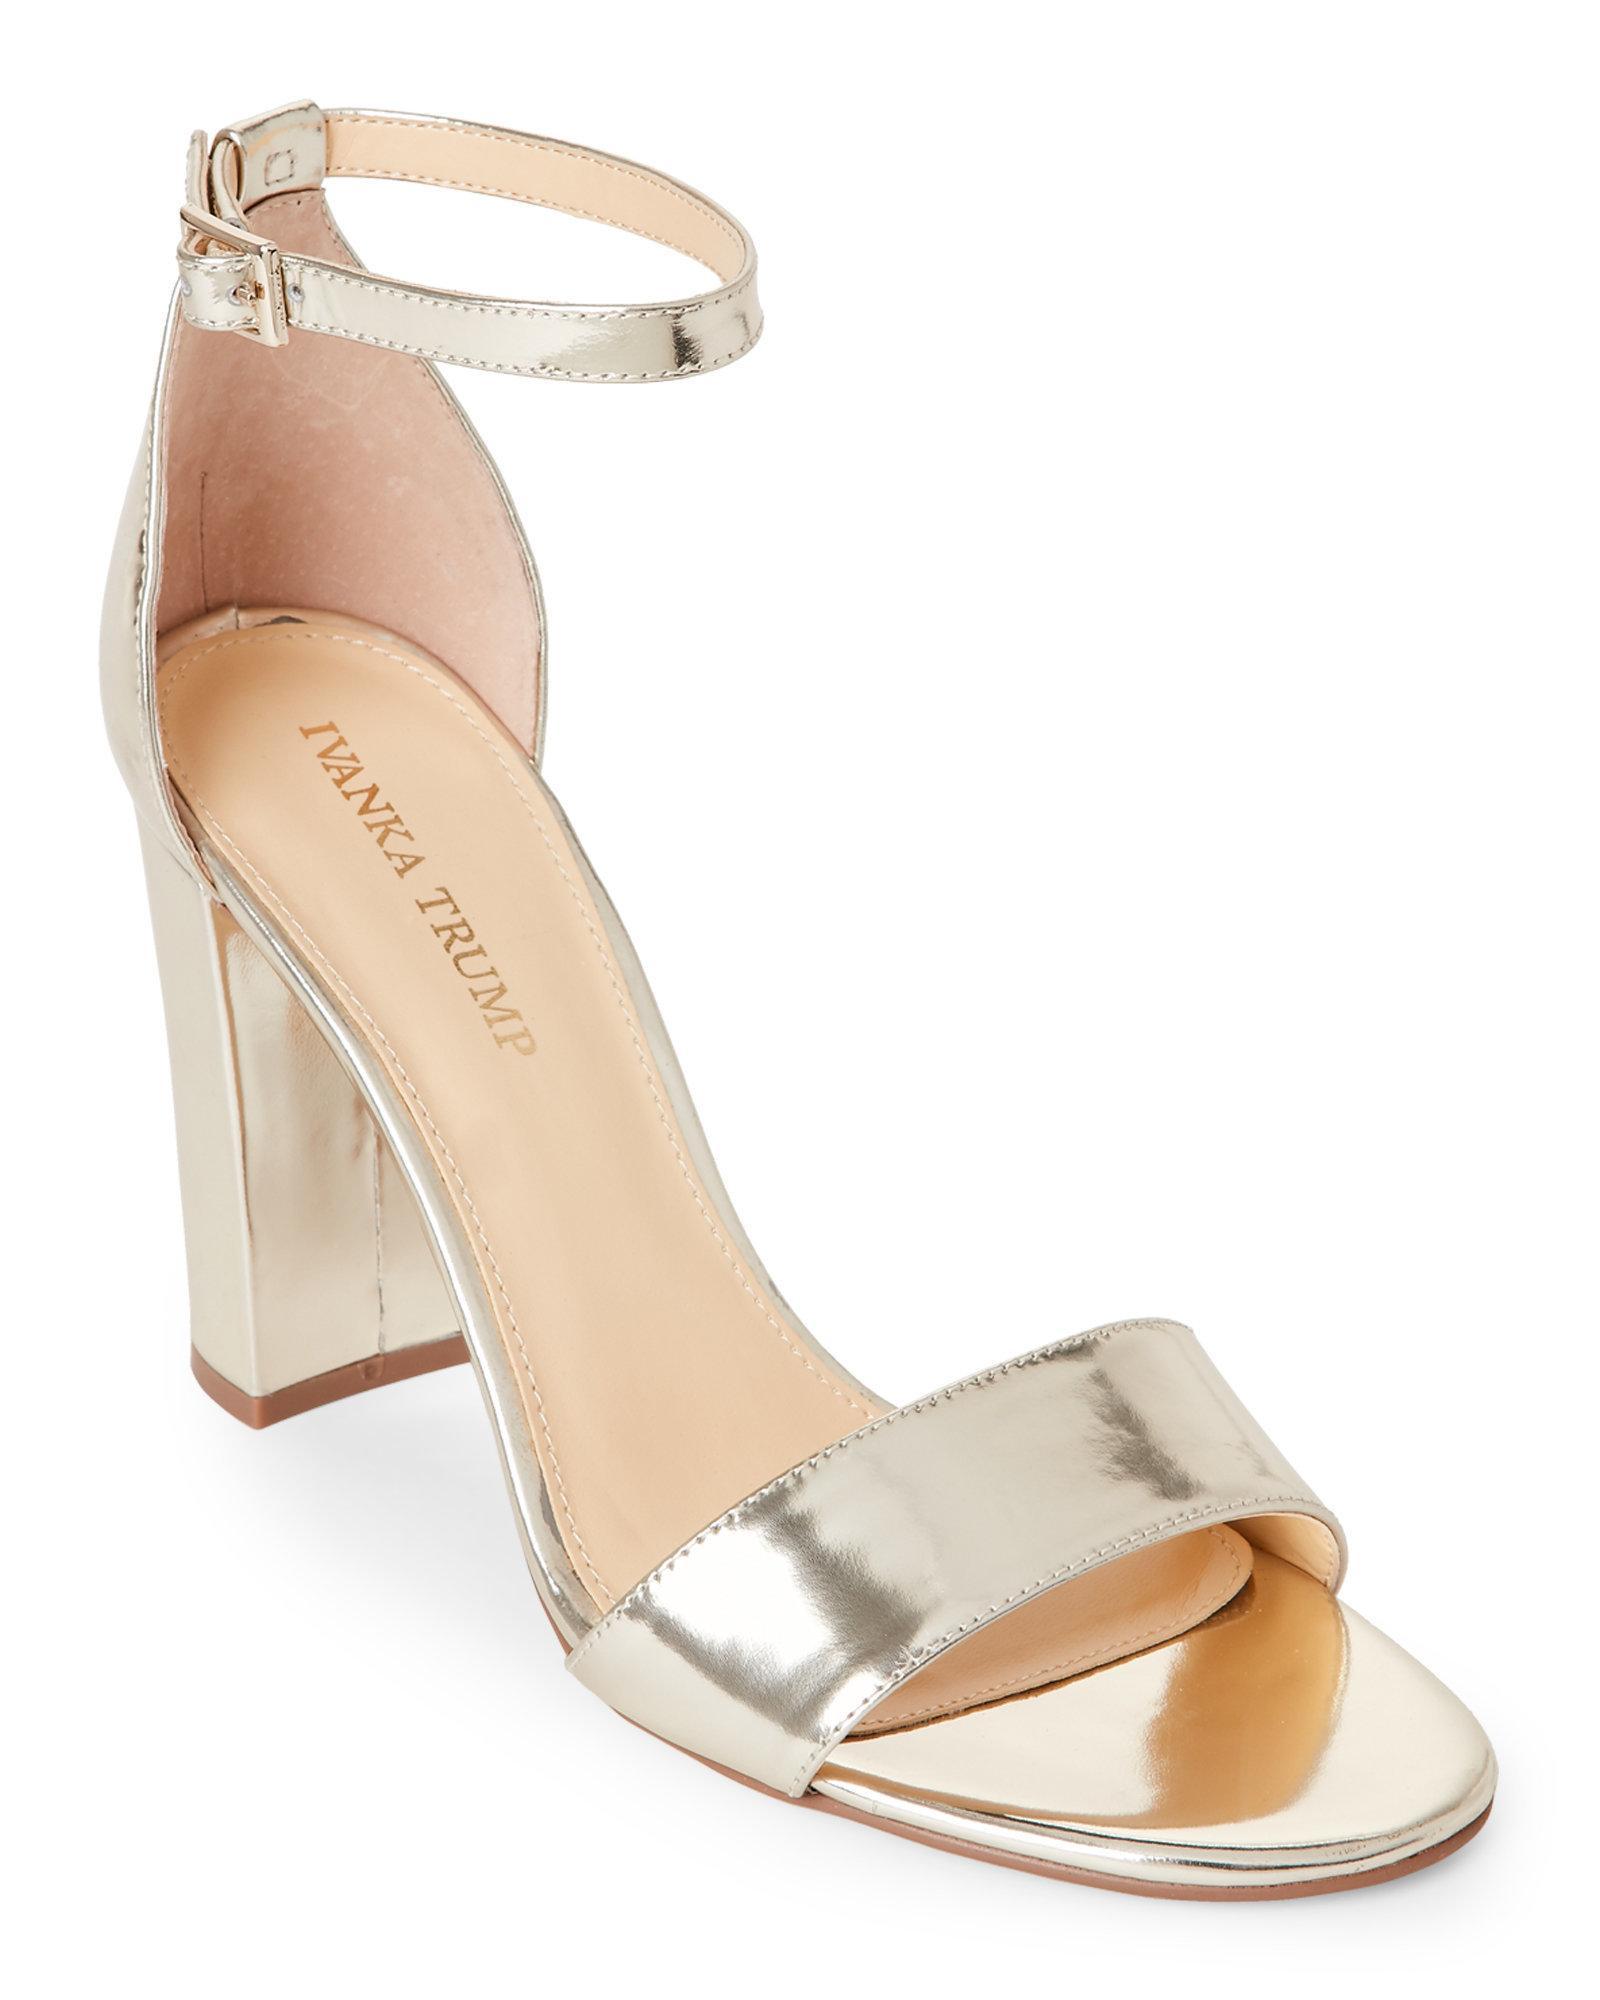 2a6ced9c219 Lyst - Ivanka Trump Light Gold Klover Block Heel Sandals in Metallic